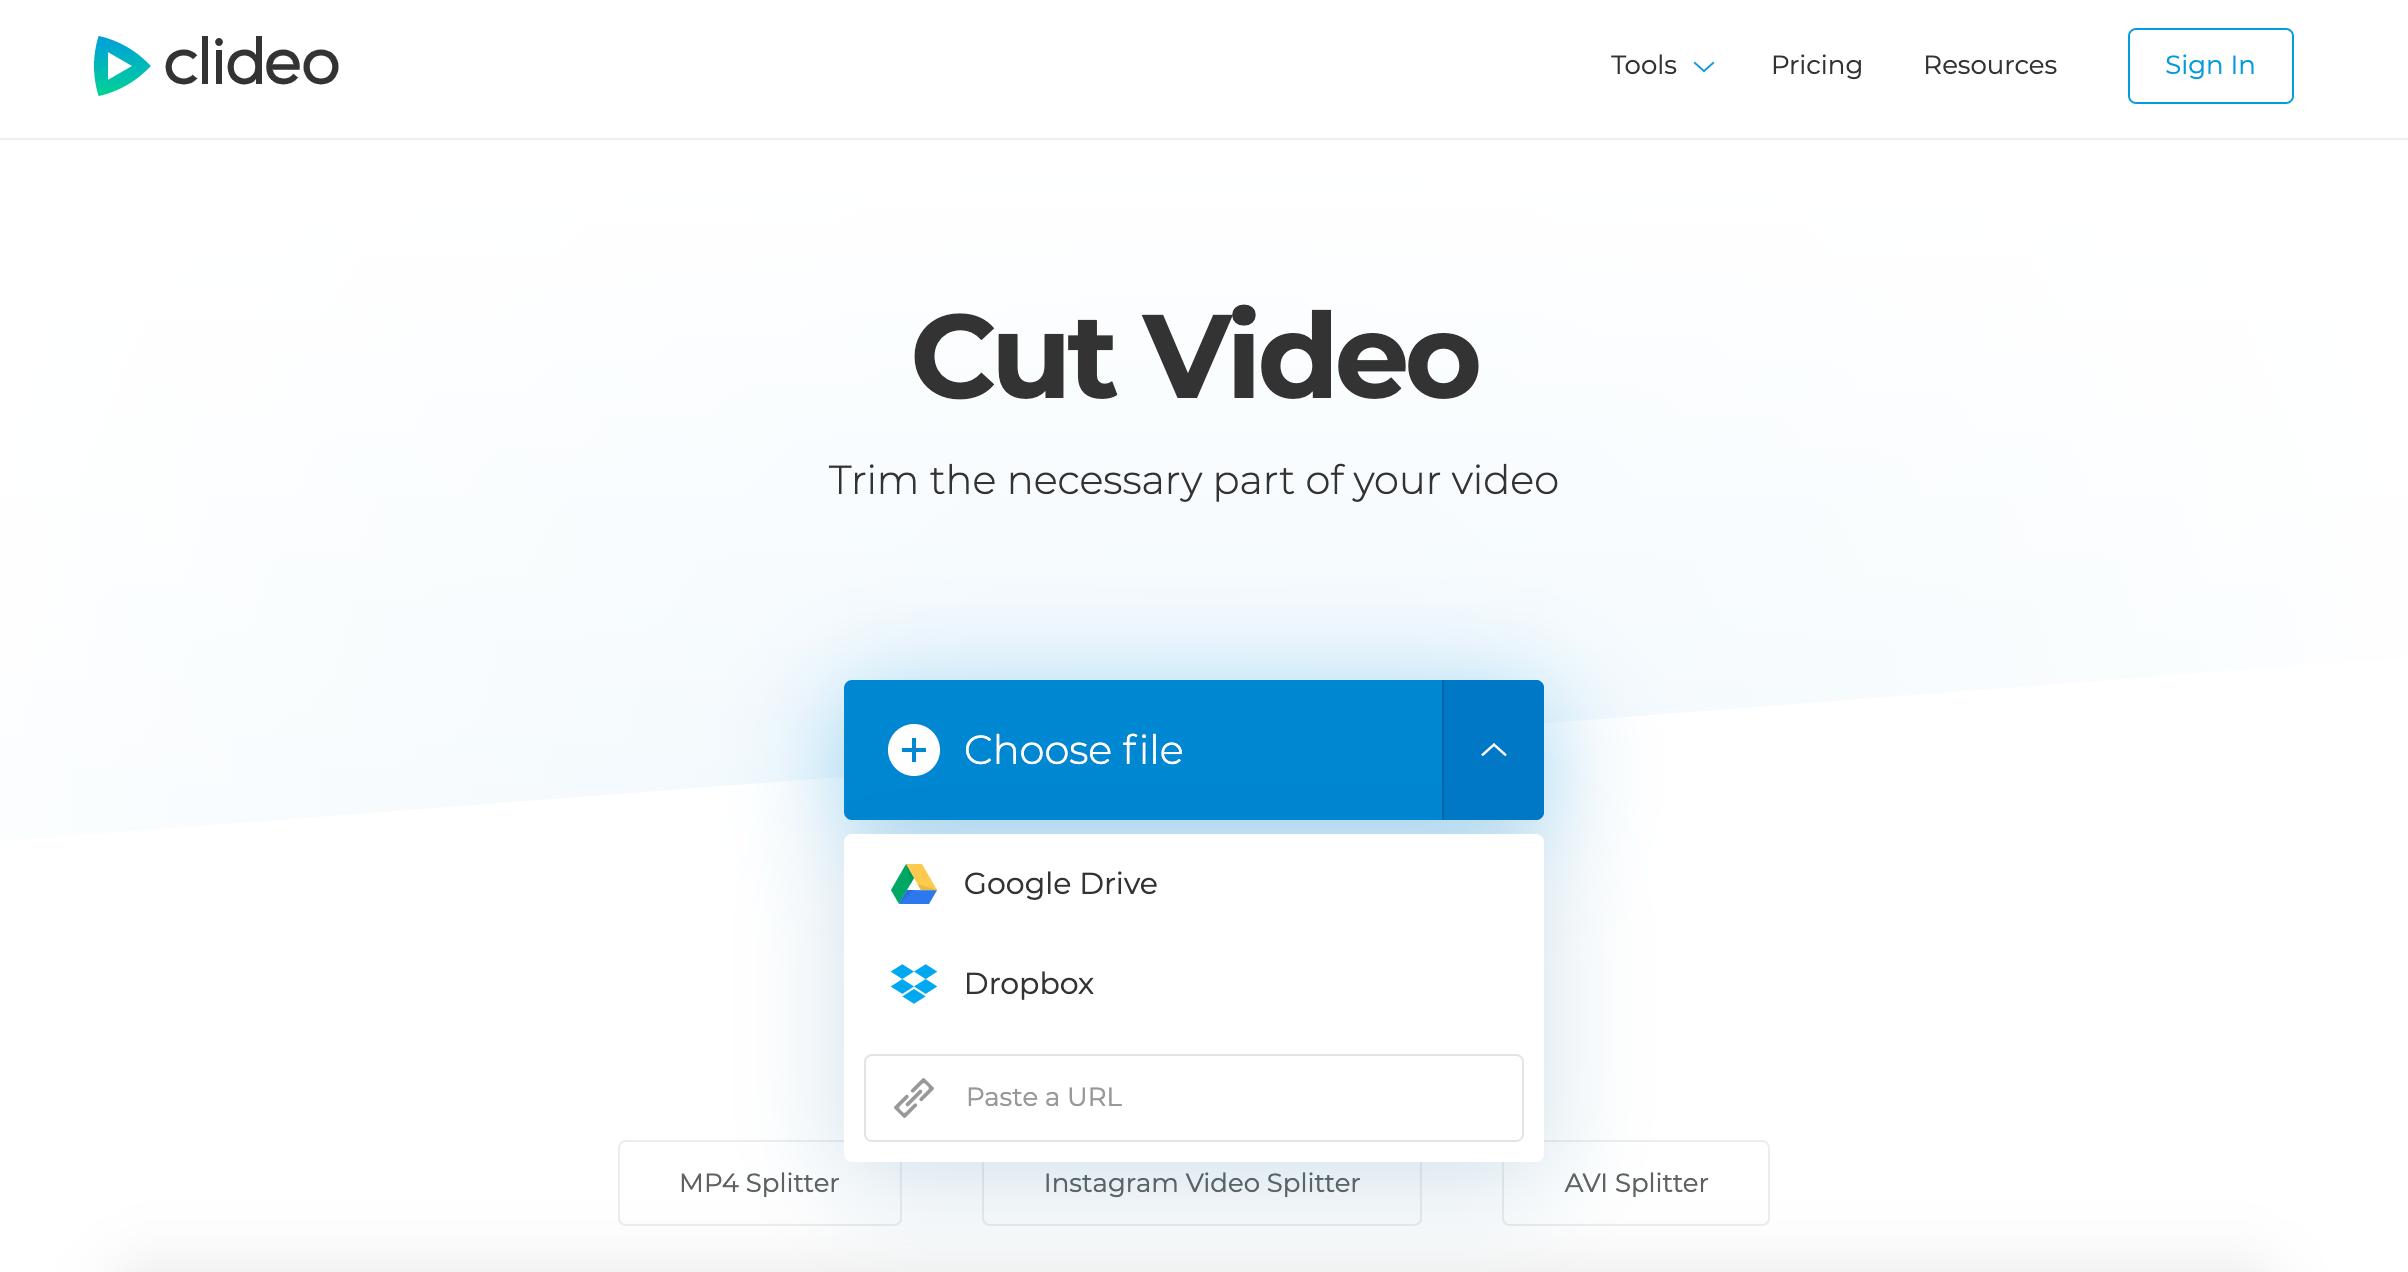 Add LinkedIn video for downloading